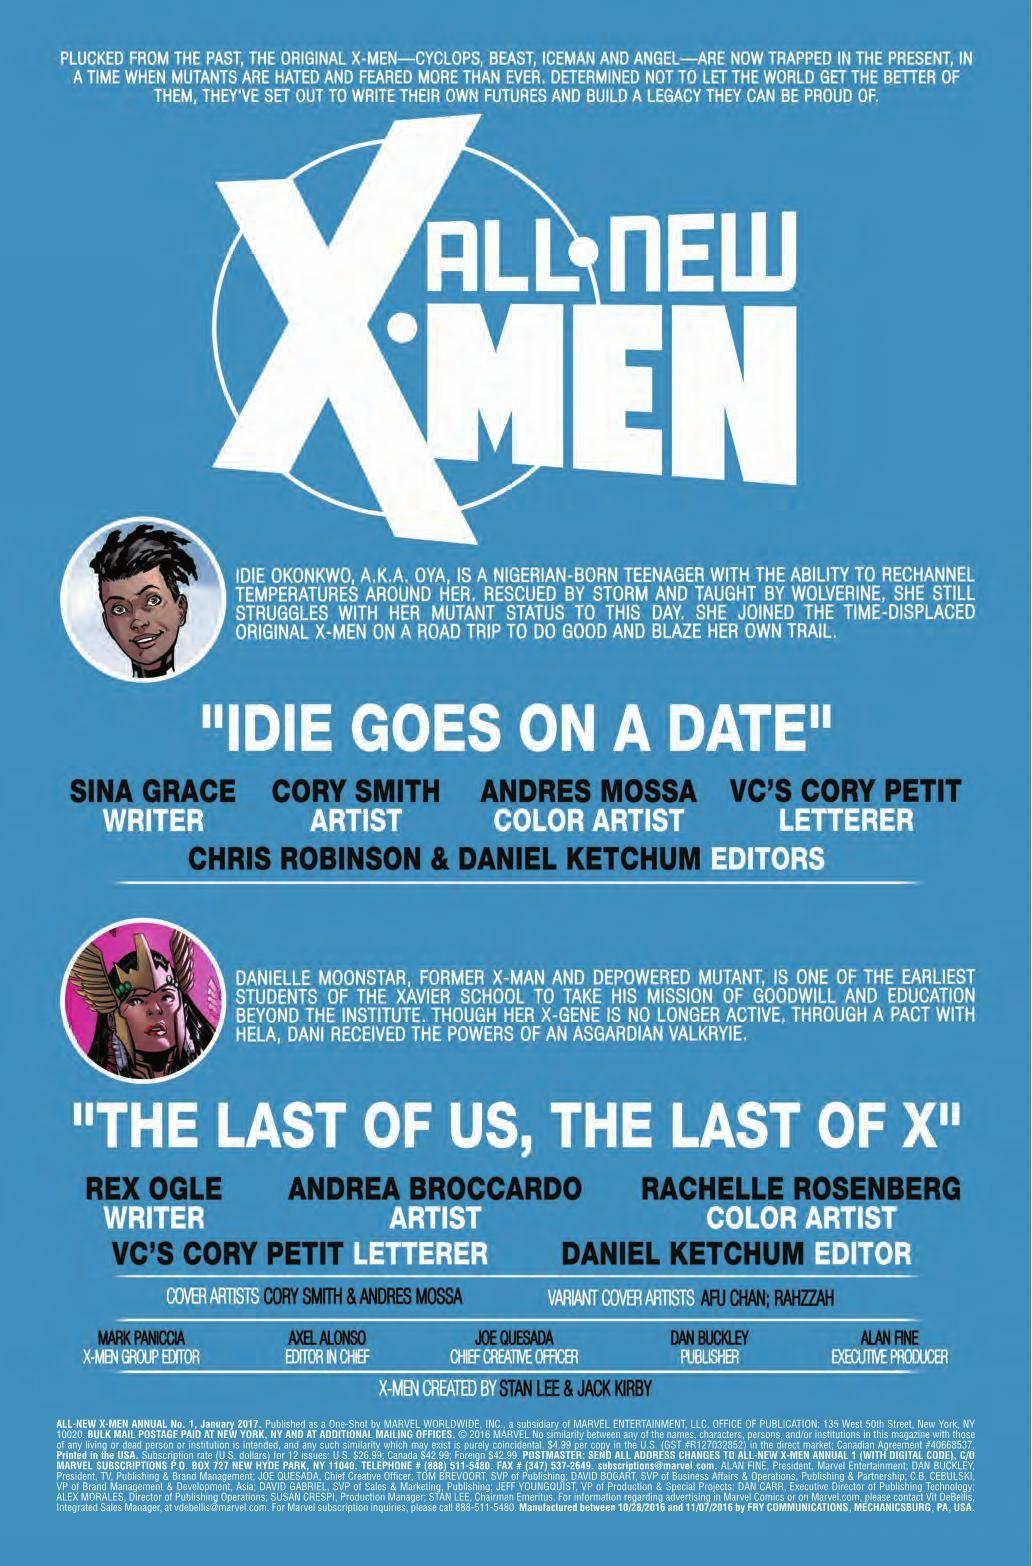 Preview All New X Men Annual 1 Story Sina Grace Rex Ogle Art Cory Smith Cover Cory Smith Publisher Marvel Publication Date Novemb X Men Men Man Beast